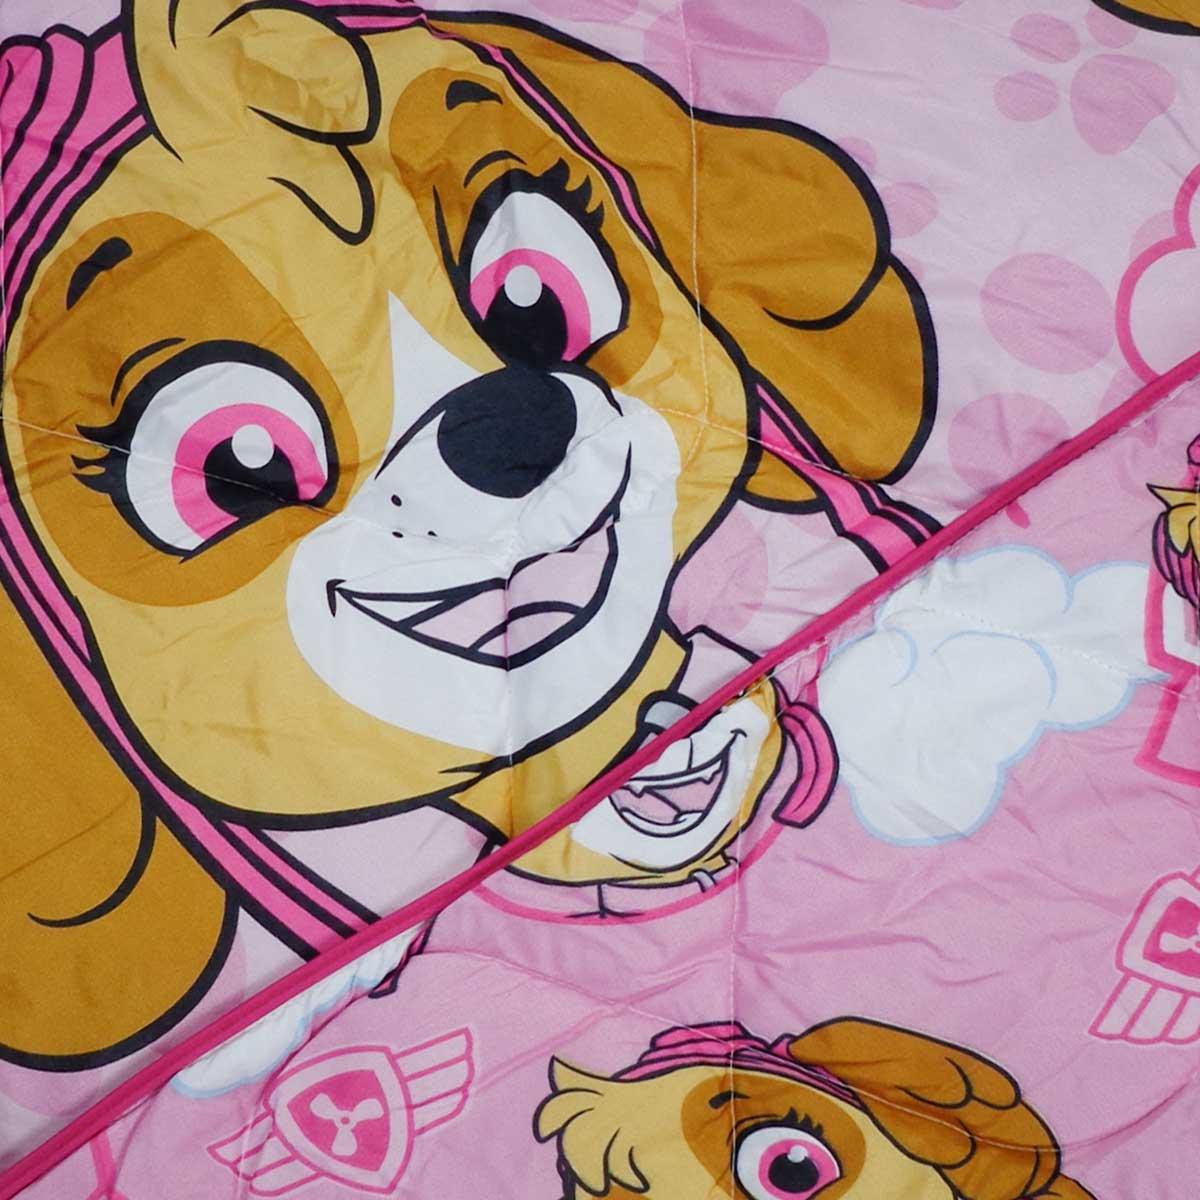 Edredom Infantil Solteiro Rosa Patrulha Canina Menina Lepper